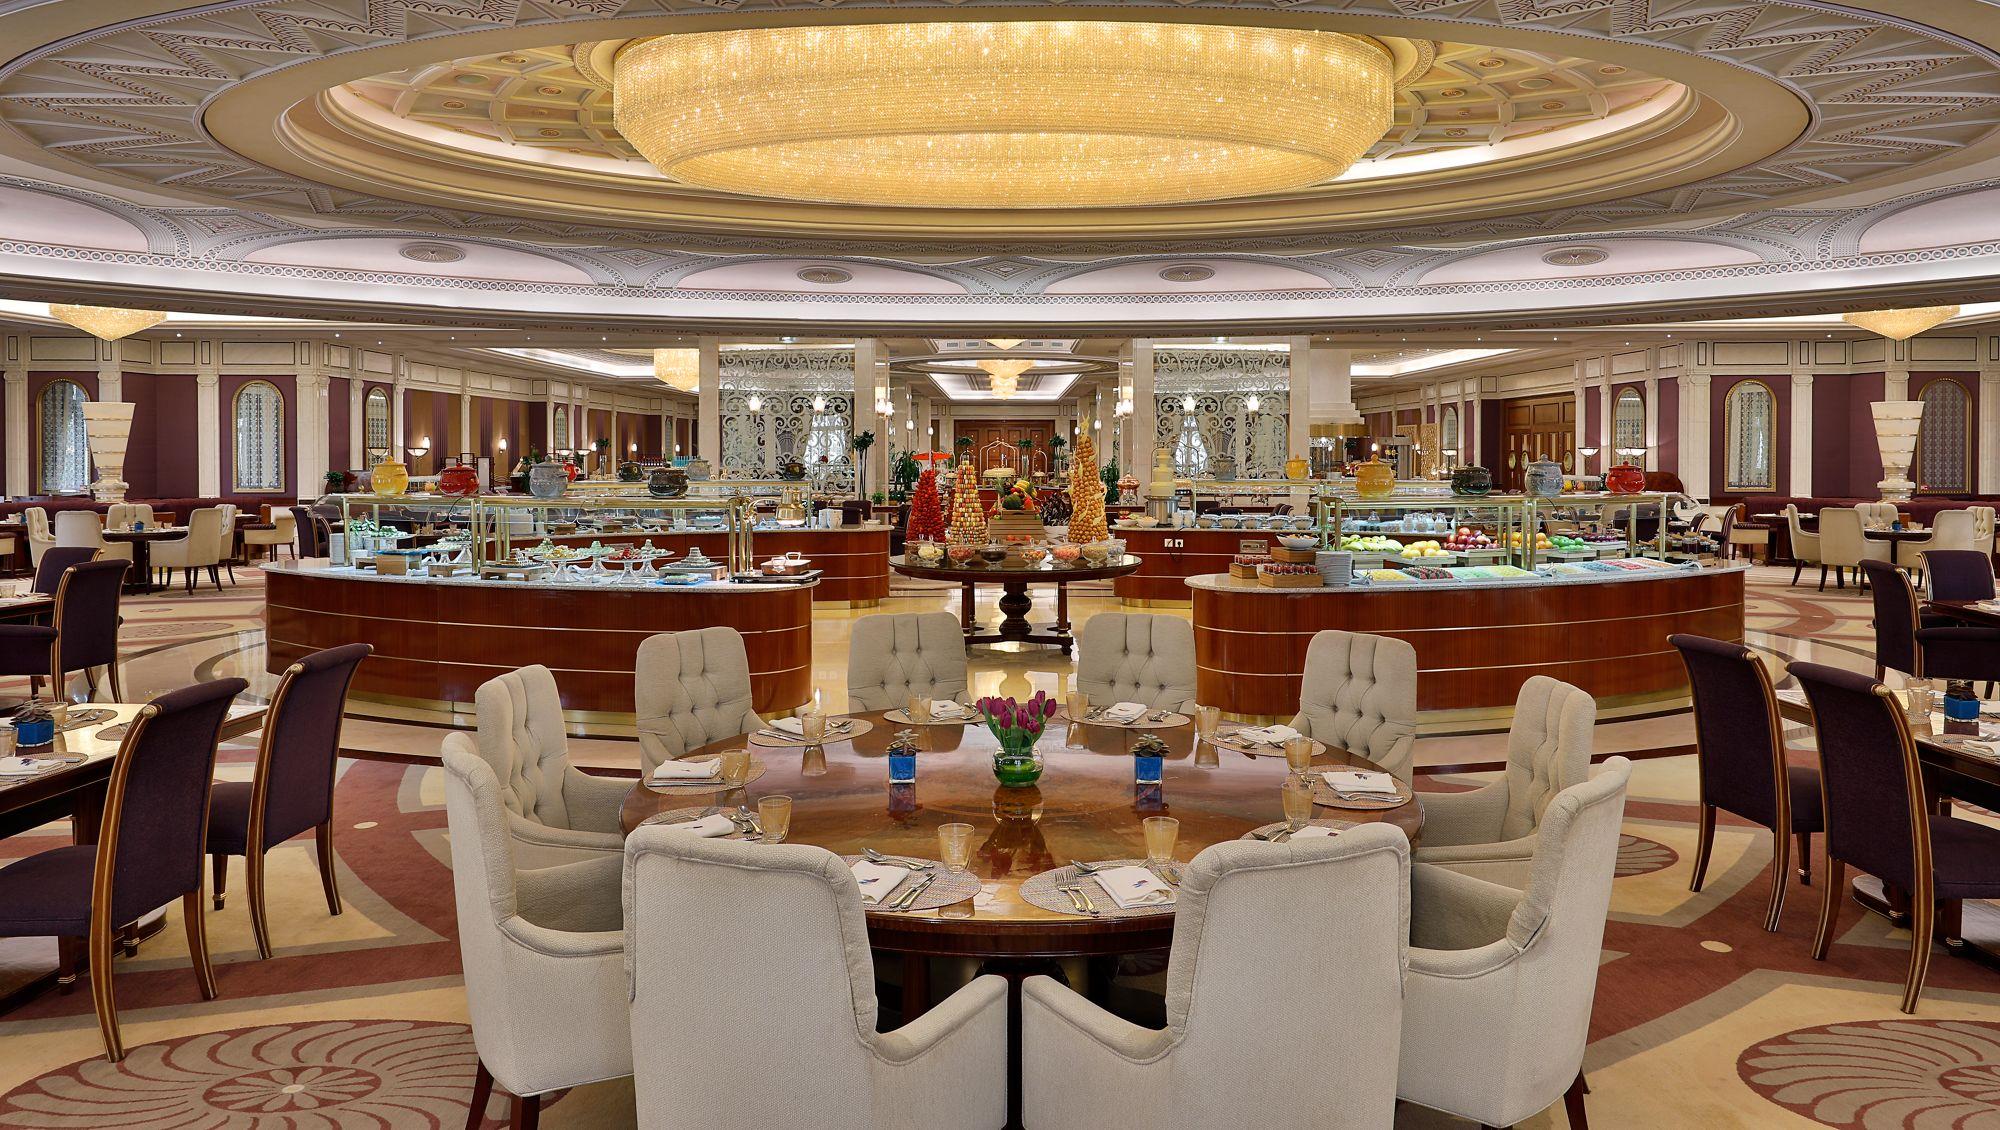 Al Orjouan Restaurant - Best Restaurants in Riyadh